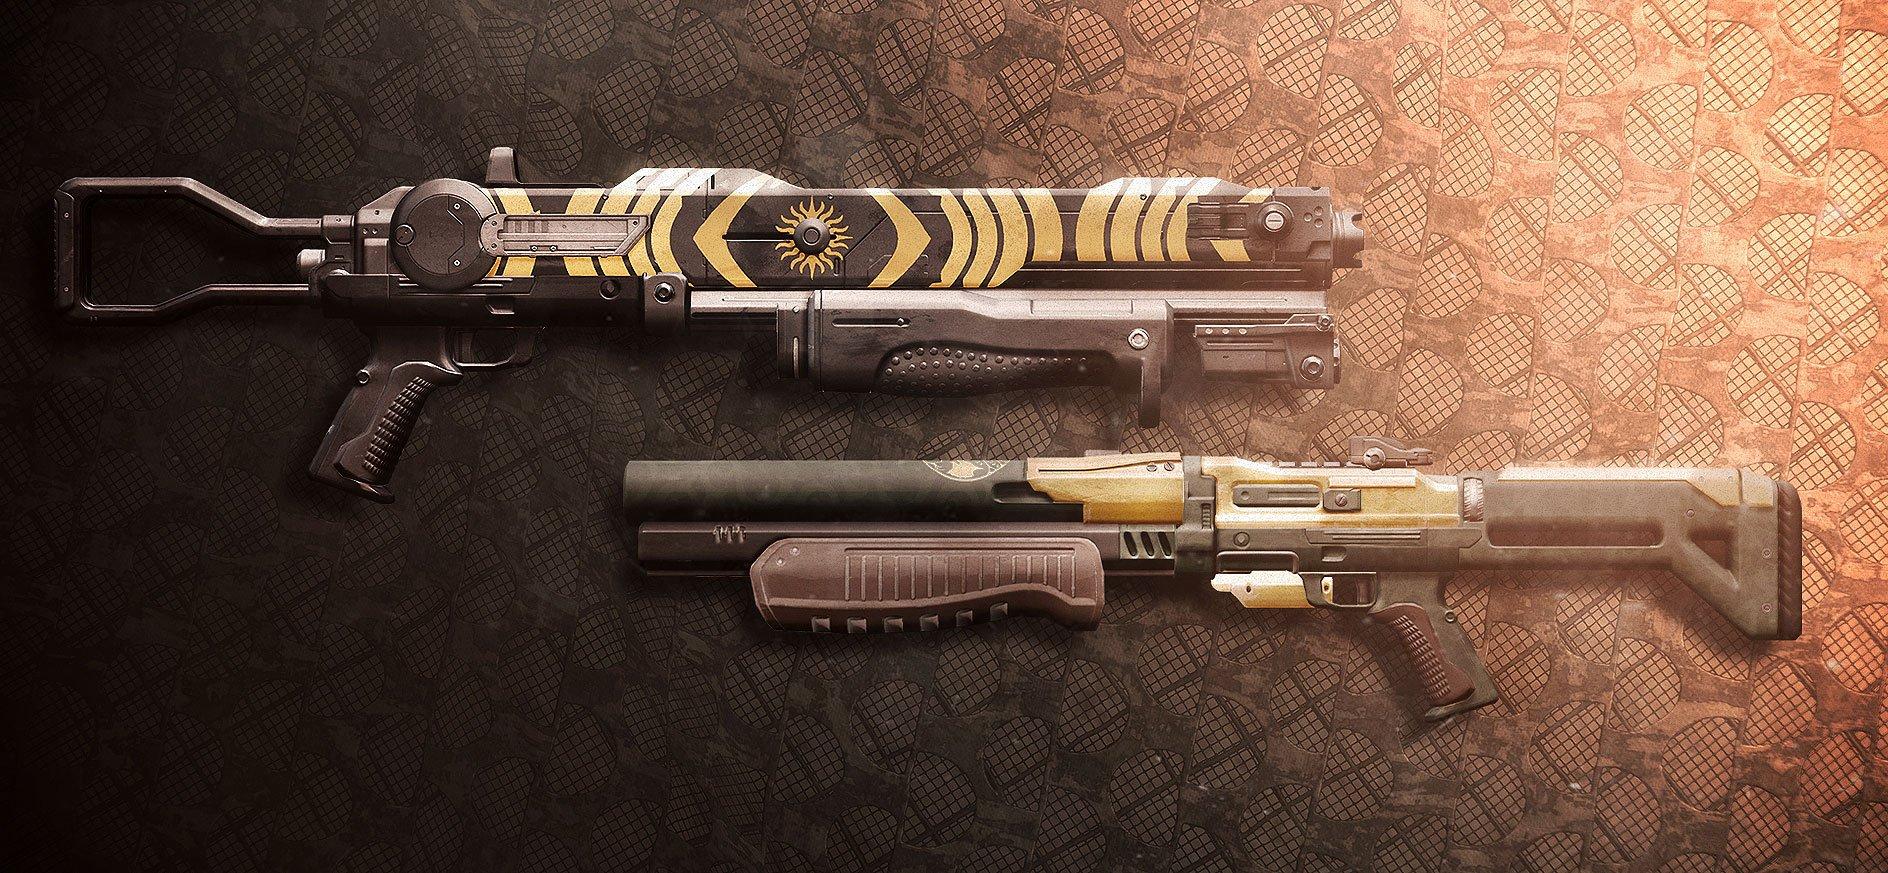 destiny 2 iron banner and trials of osiris shotguns